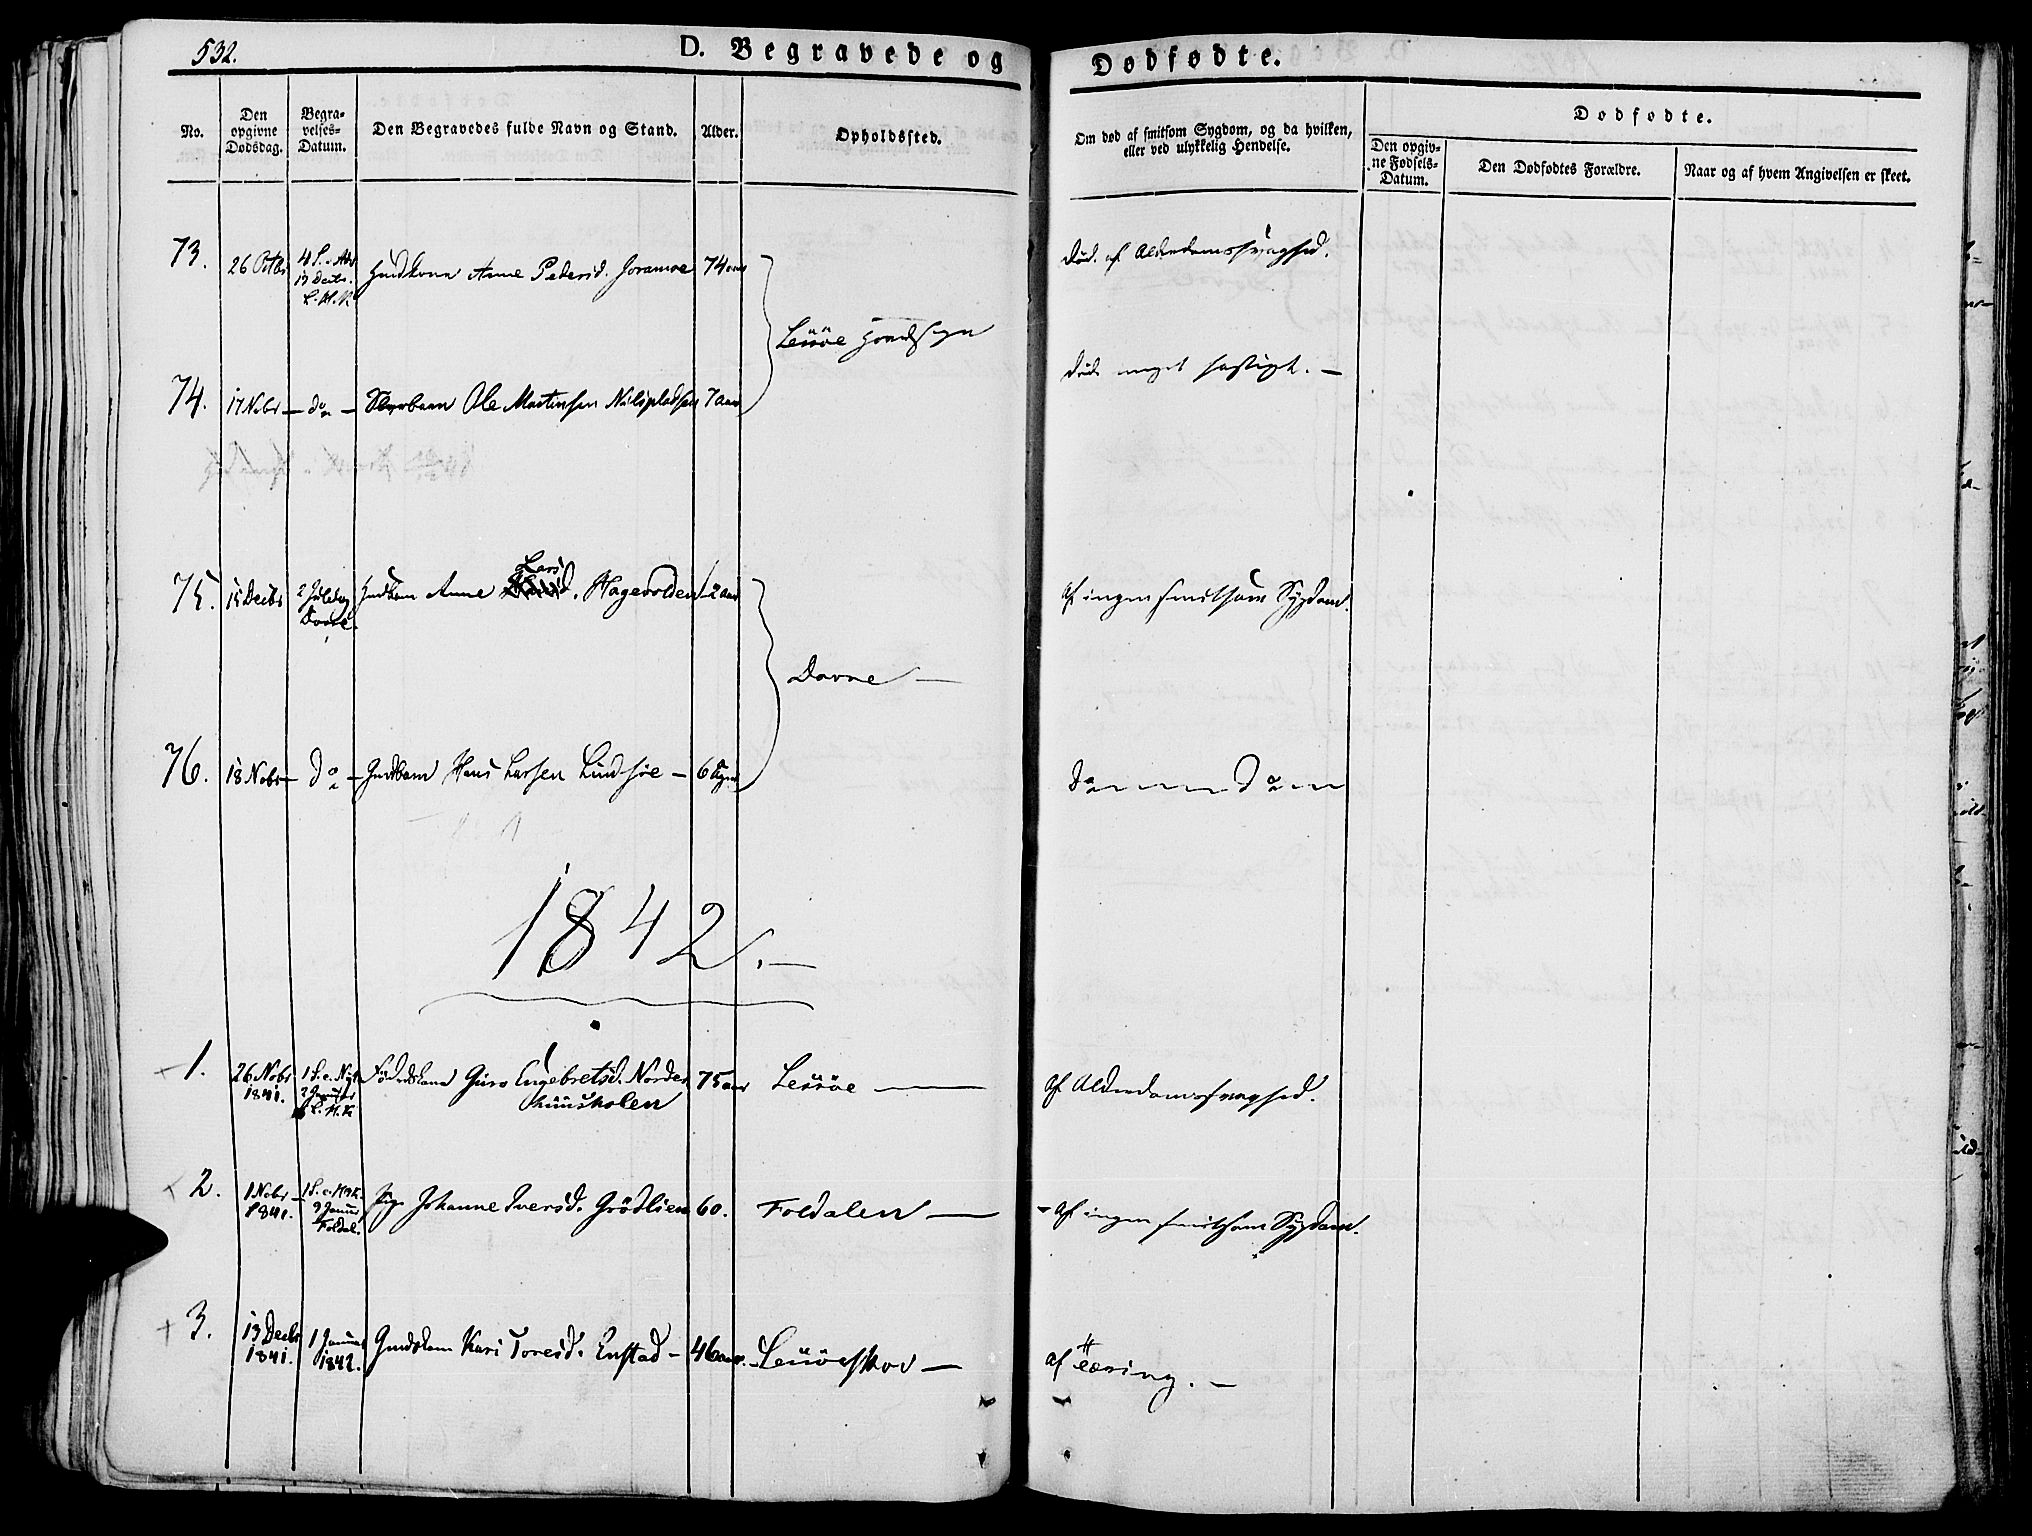 SAH, Lesja prestekontor, Ministerialbok nr. 5, 1830-1842, s. 532